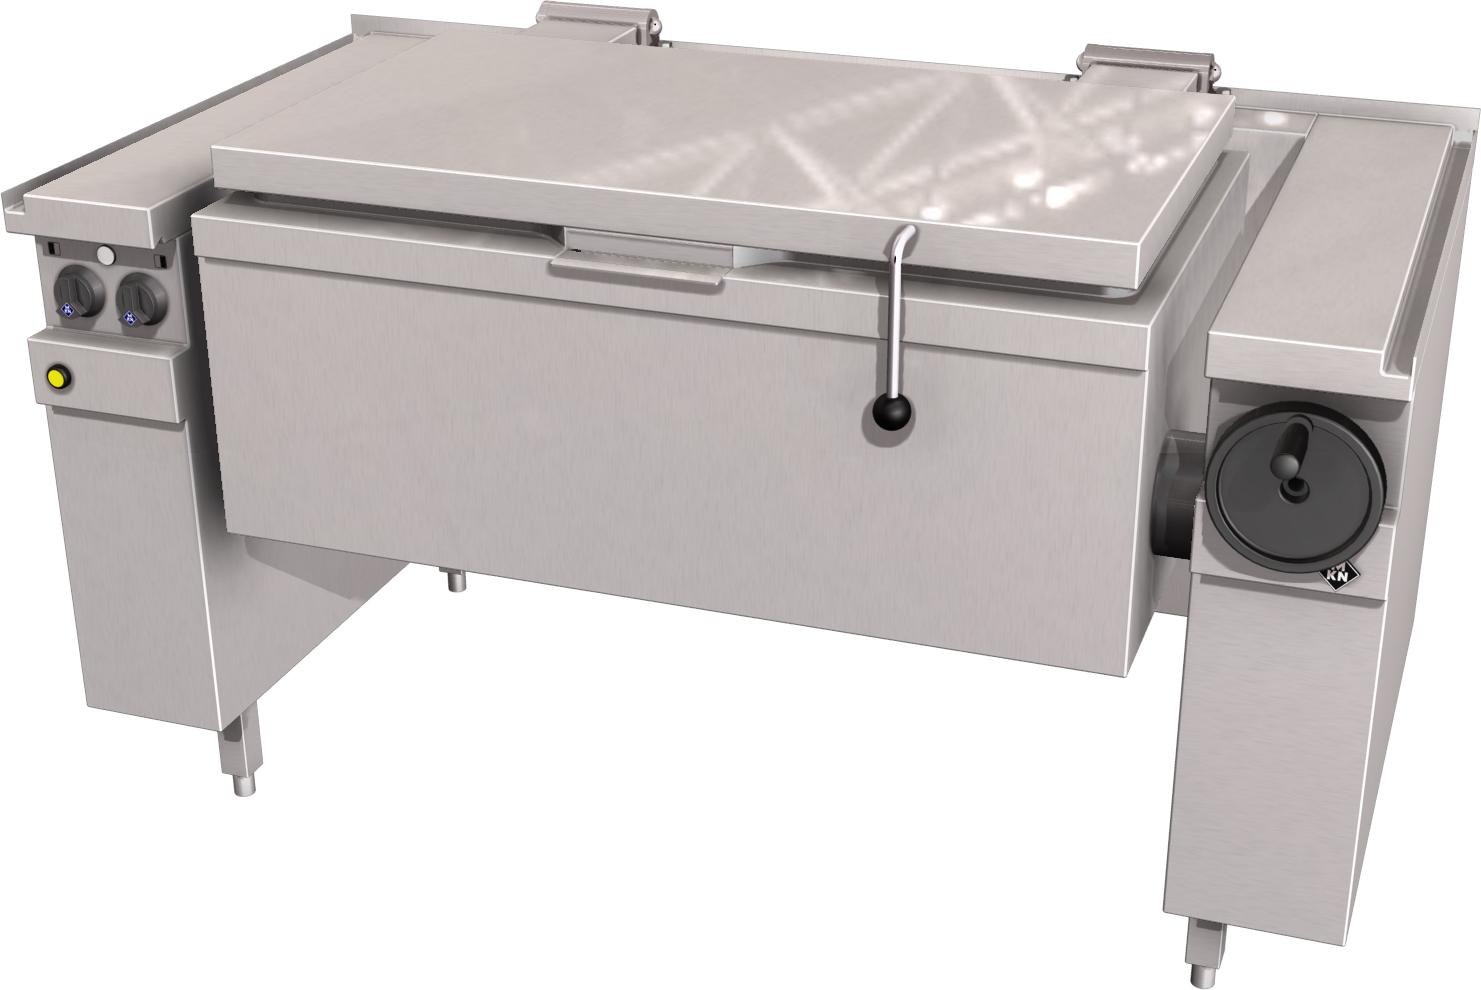 Tilting Bratt Pans - 2061444C